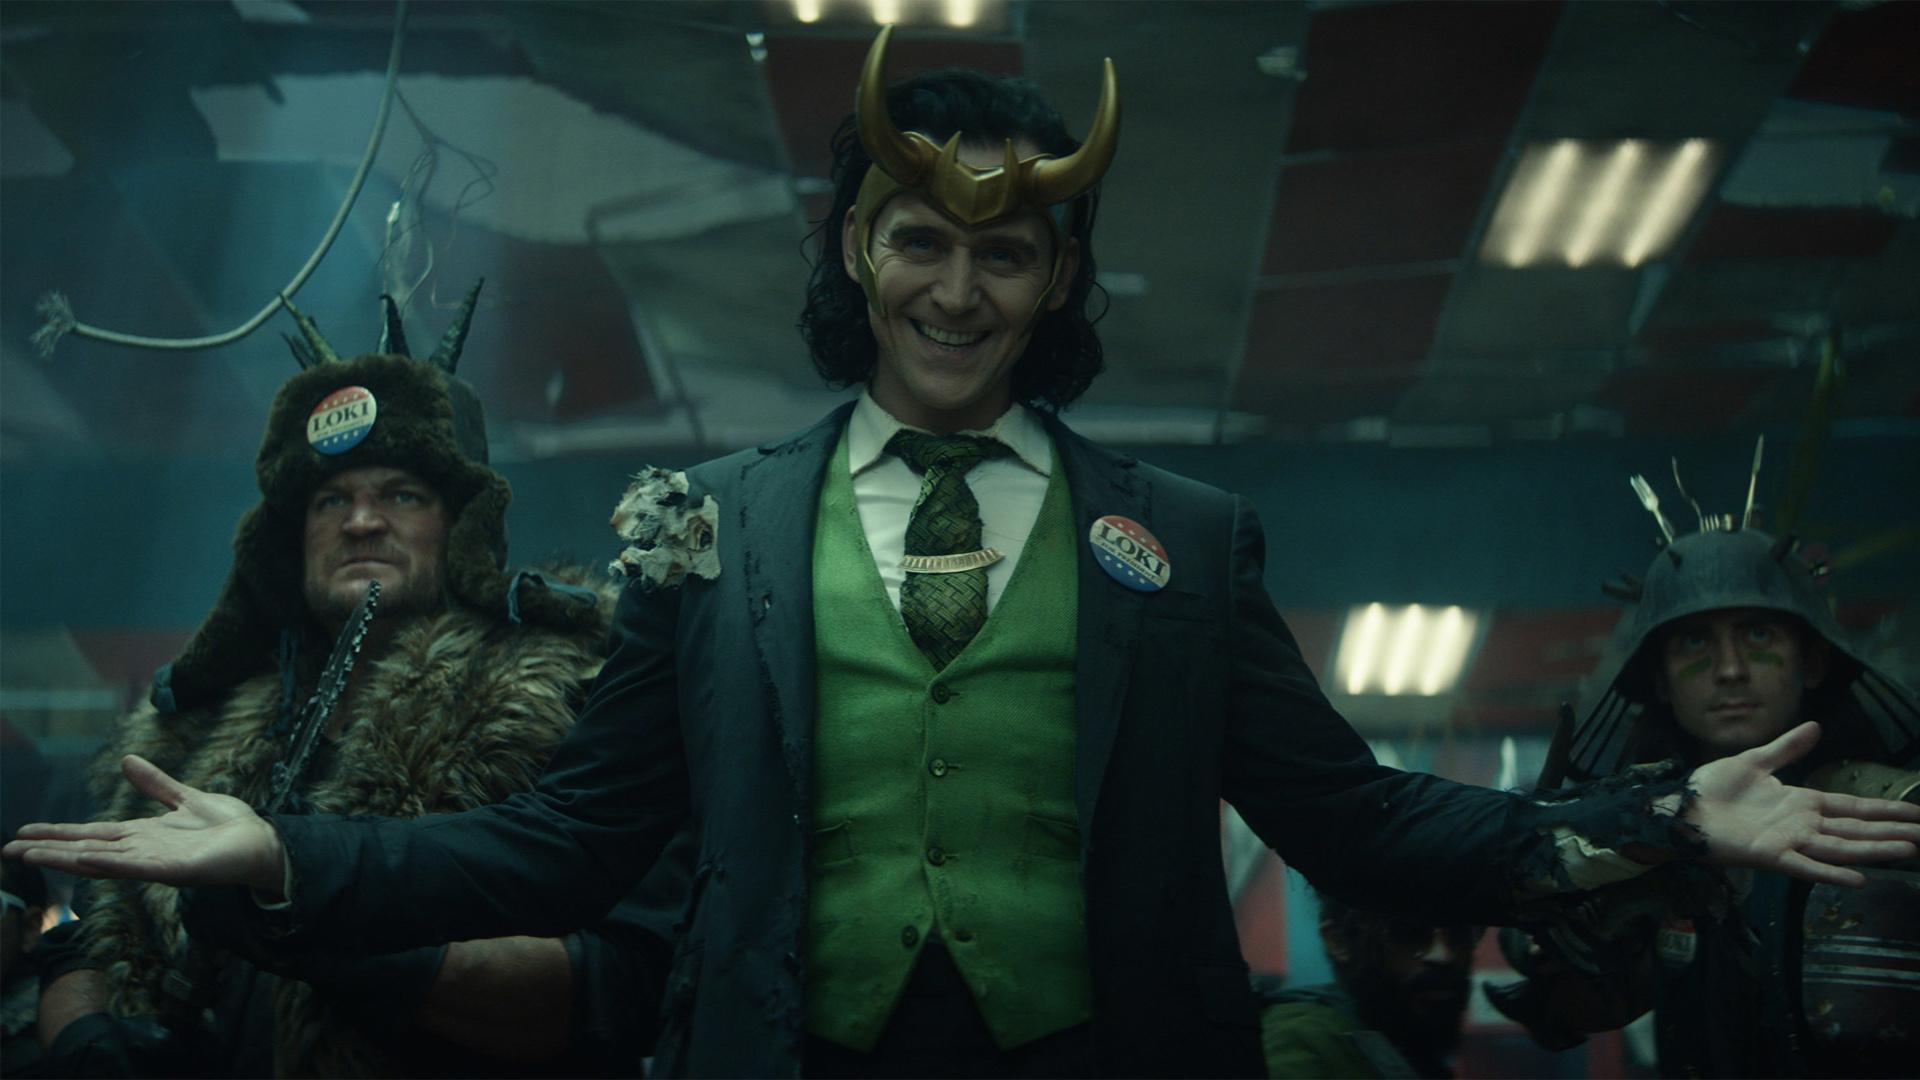 Spoiled Rotten 144 – Loki: Journey Into Mystery